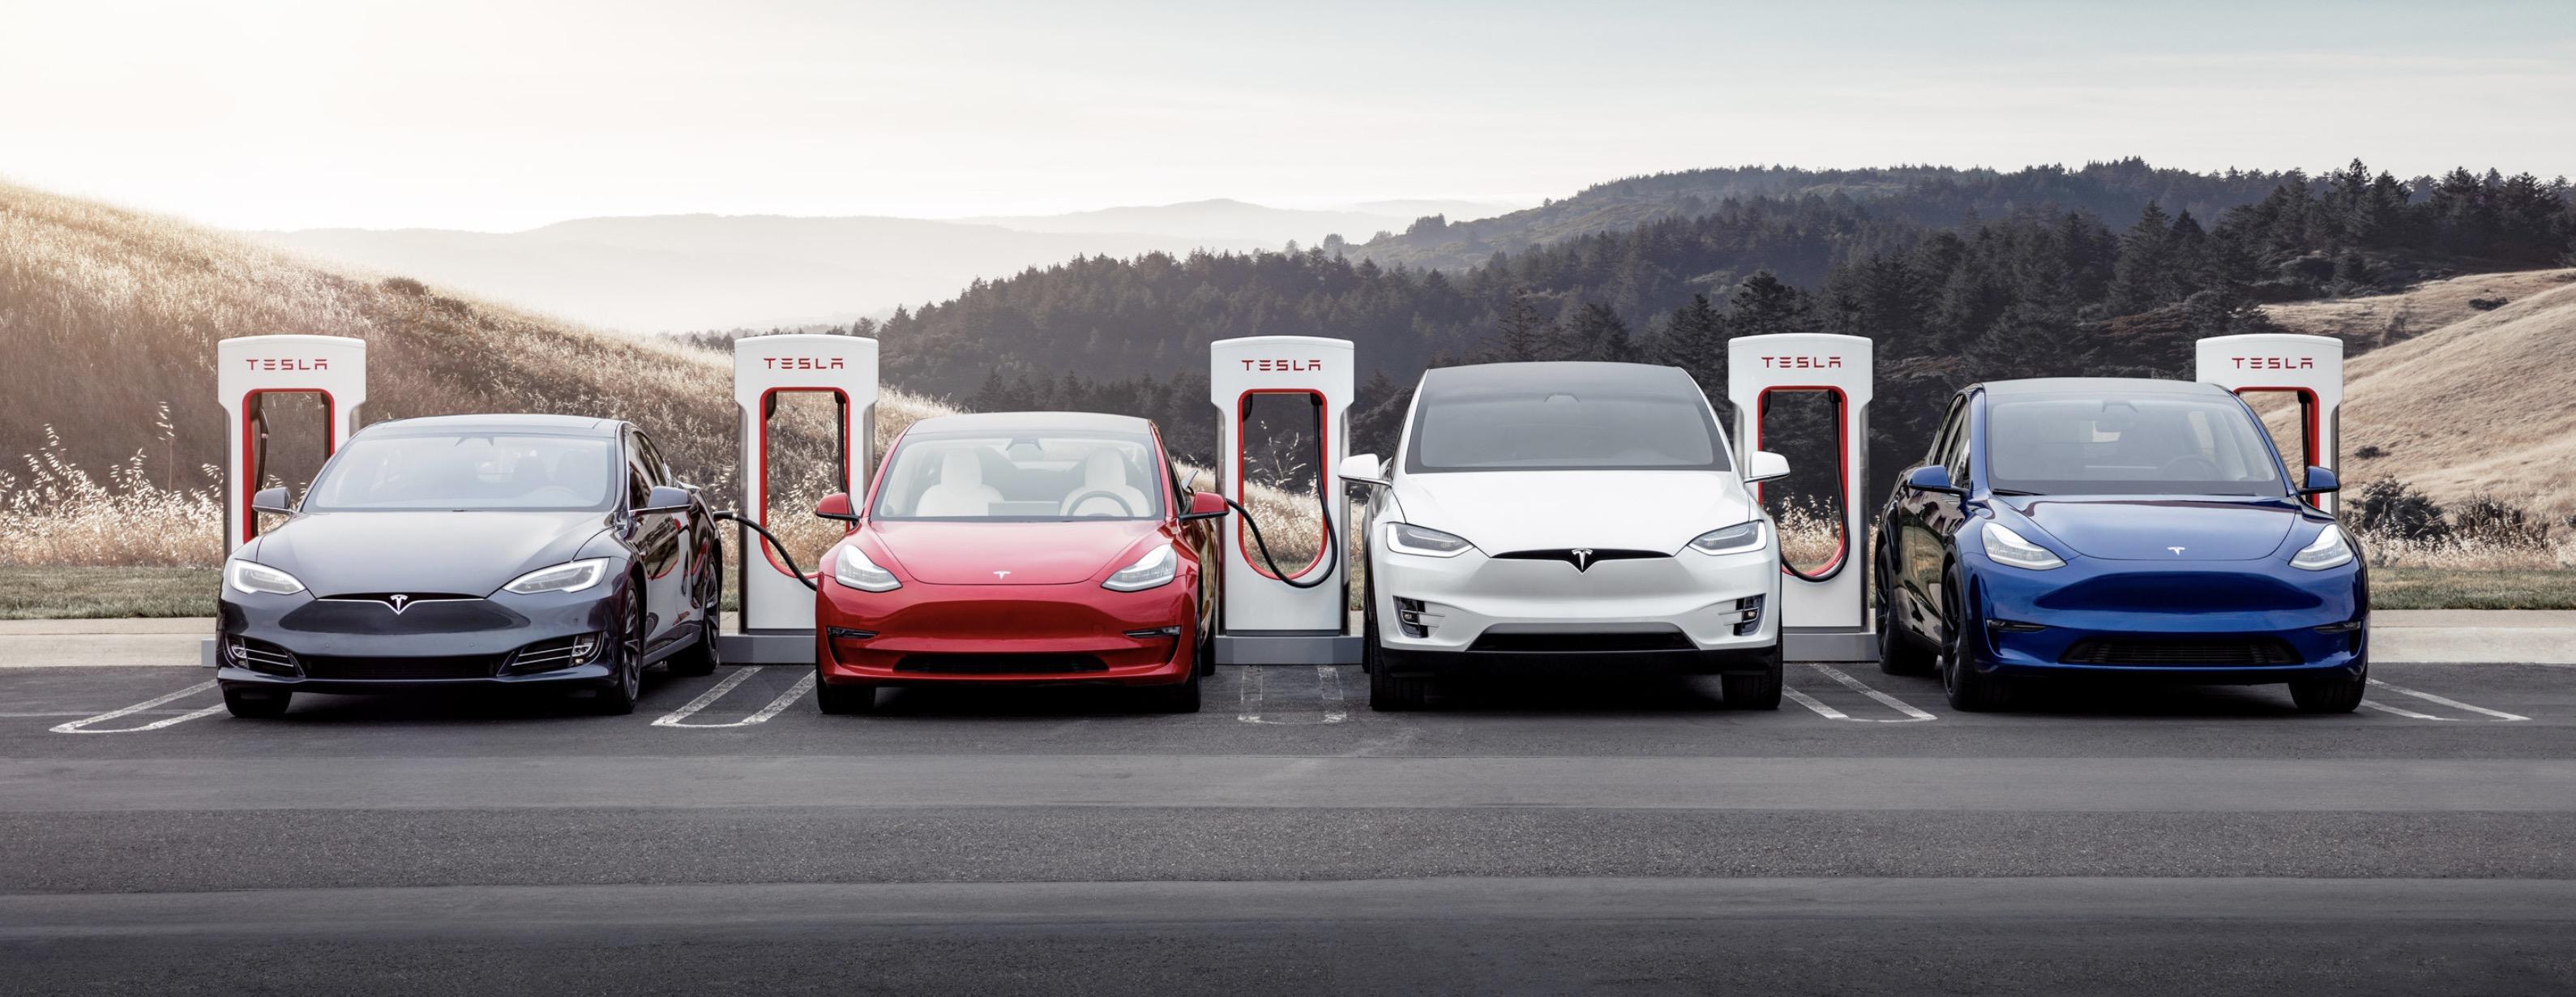 Tesla (TSLA) could surprise with strong deliveries in Q1 despite production constraints - Electrek